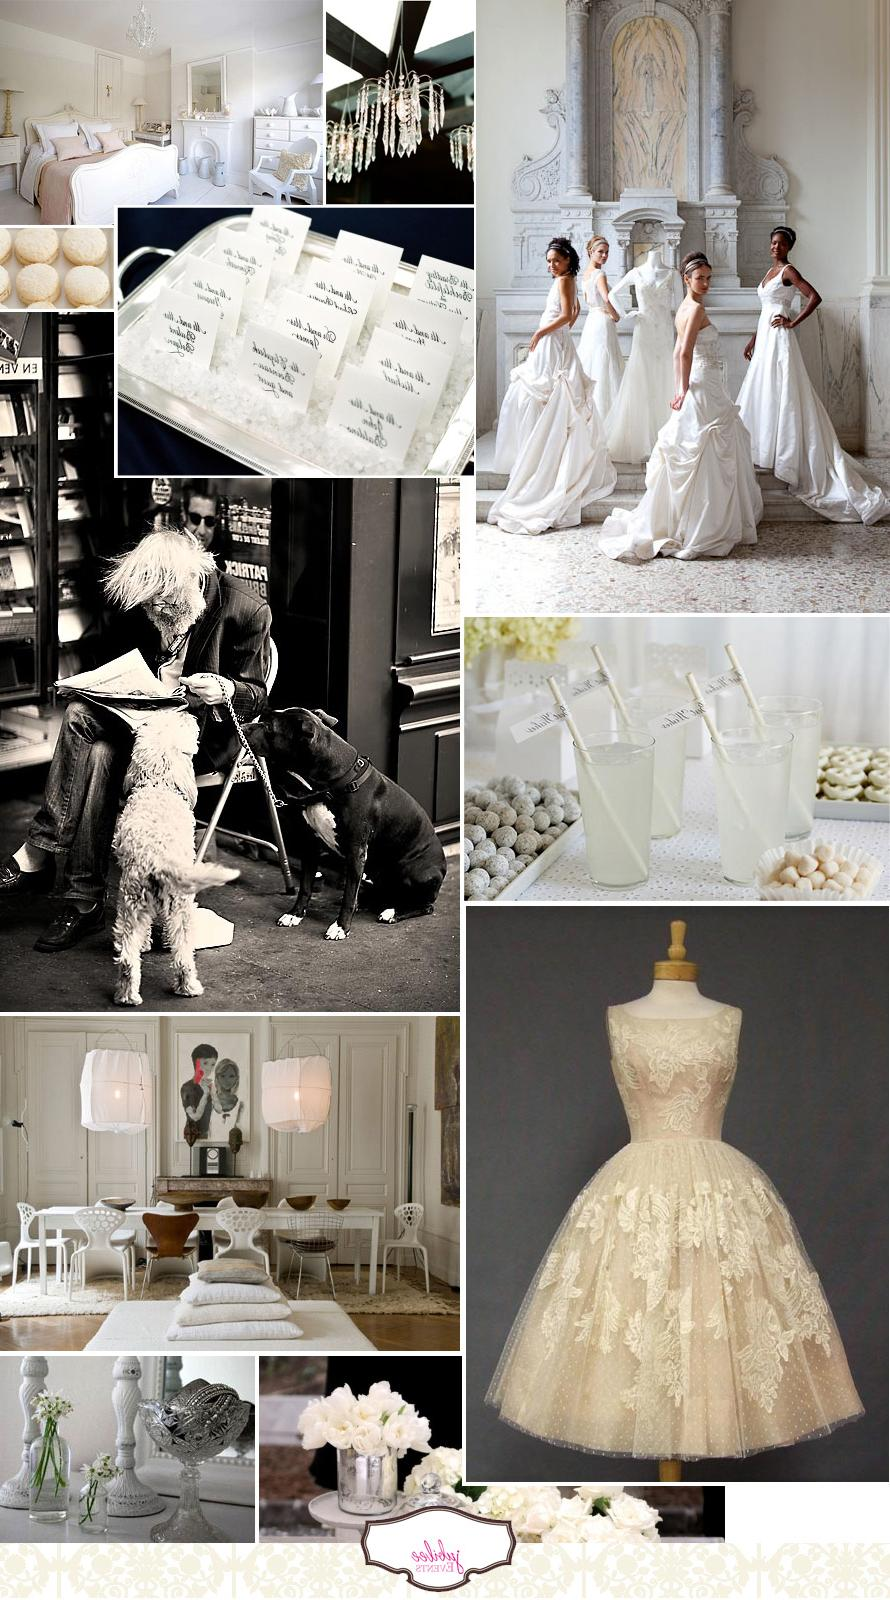 wedding gowns by Kirstie